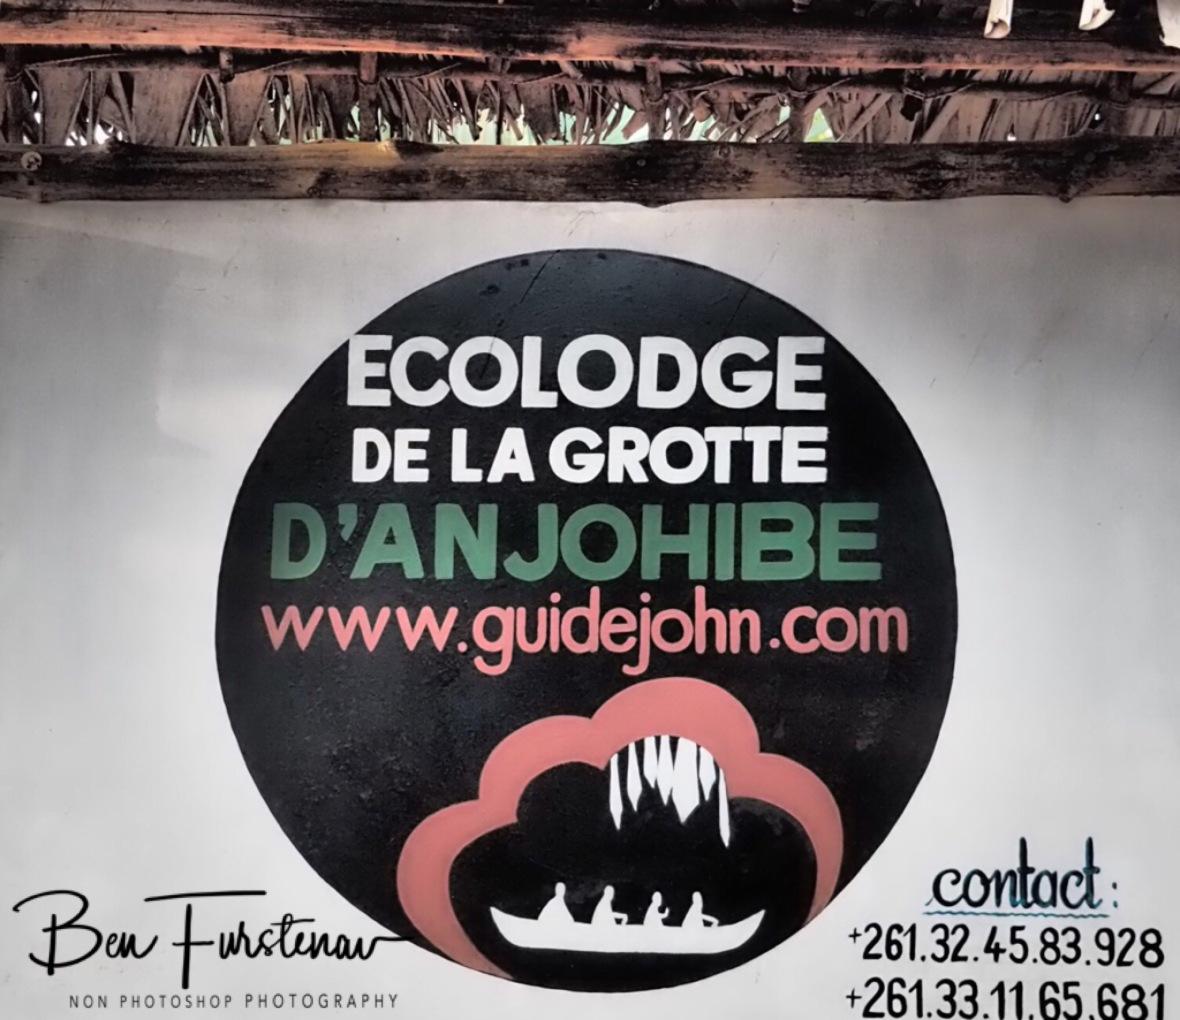 Ecolodge info